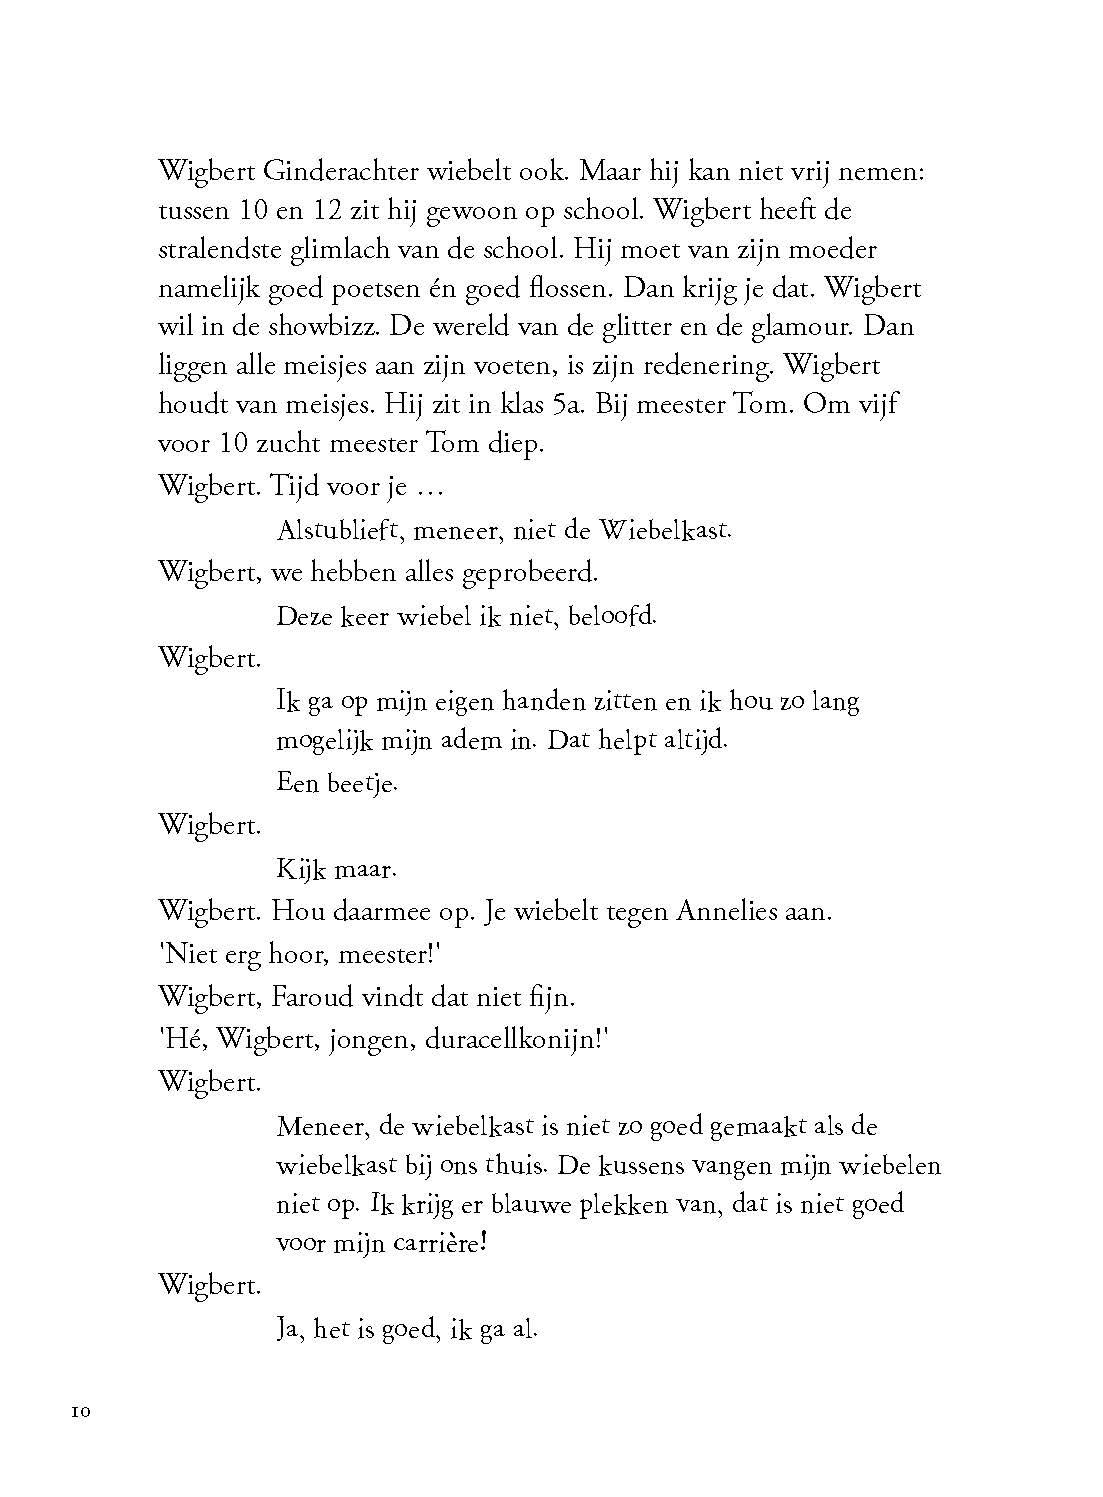 Mevrouw Moes pagina 6